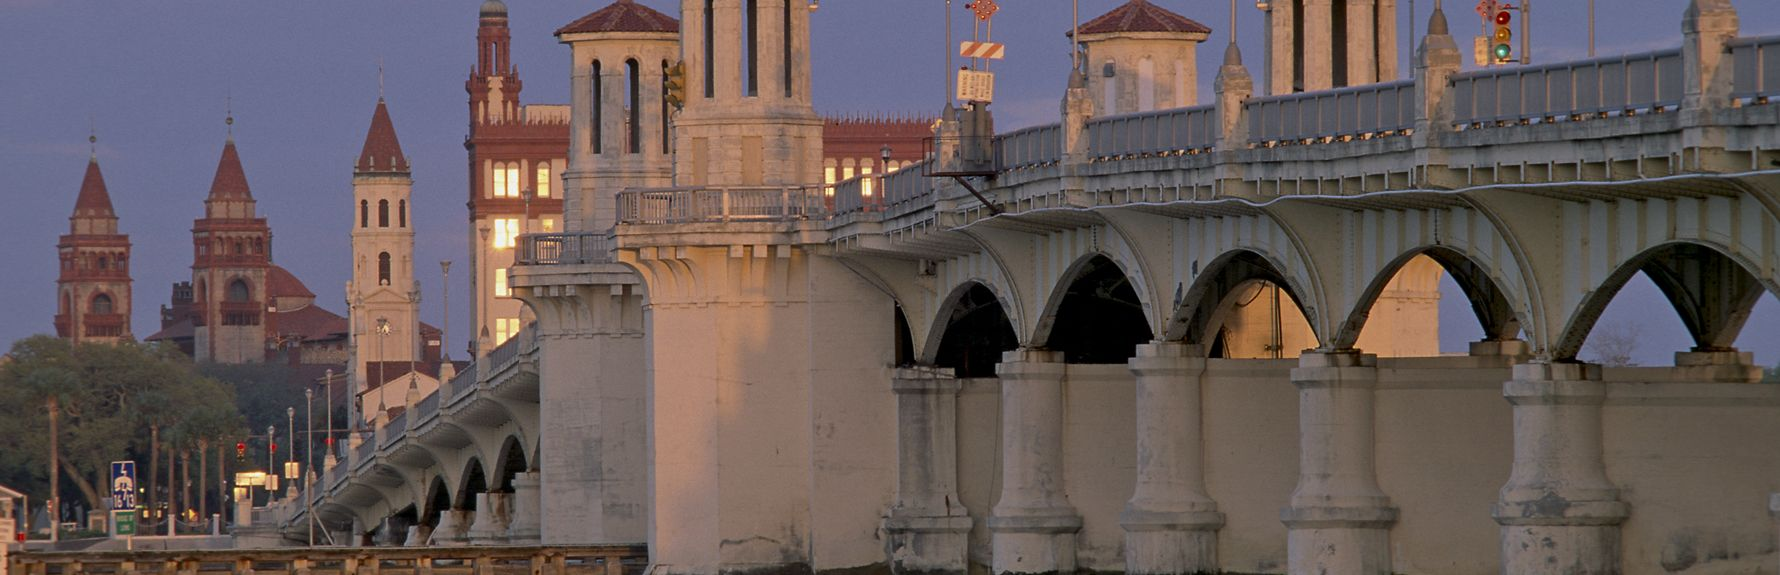 Città Vecchia, St. Augustine, Florida, Stati Uniti d'America